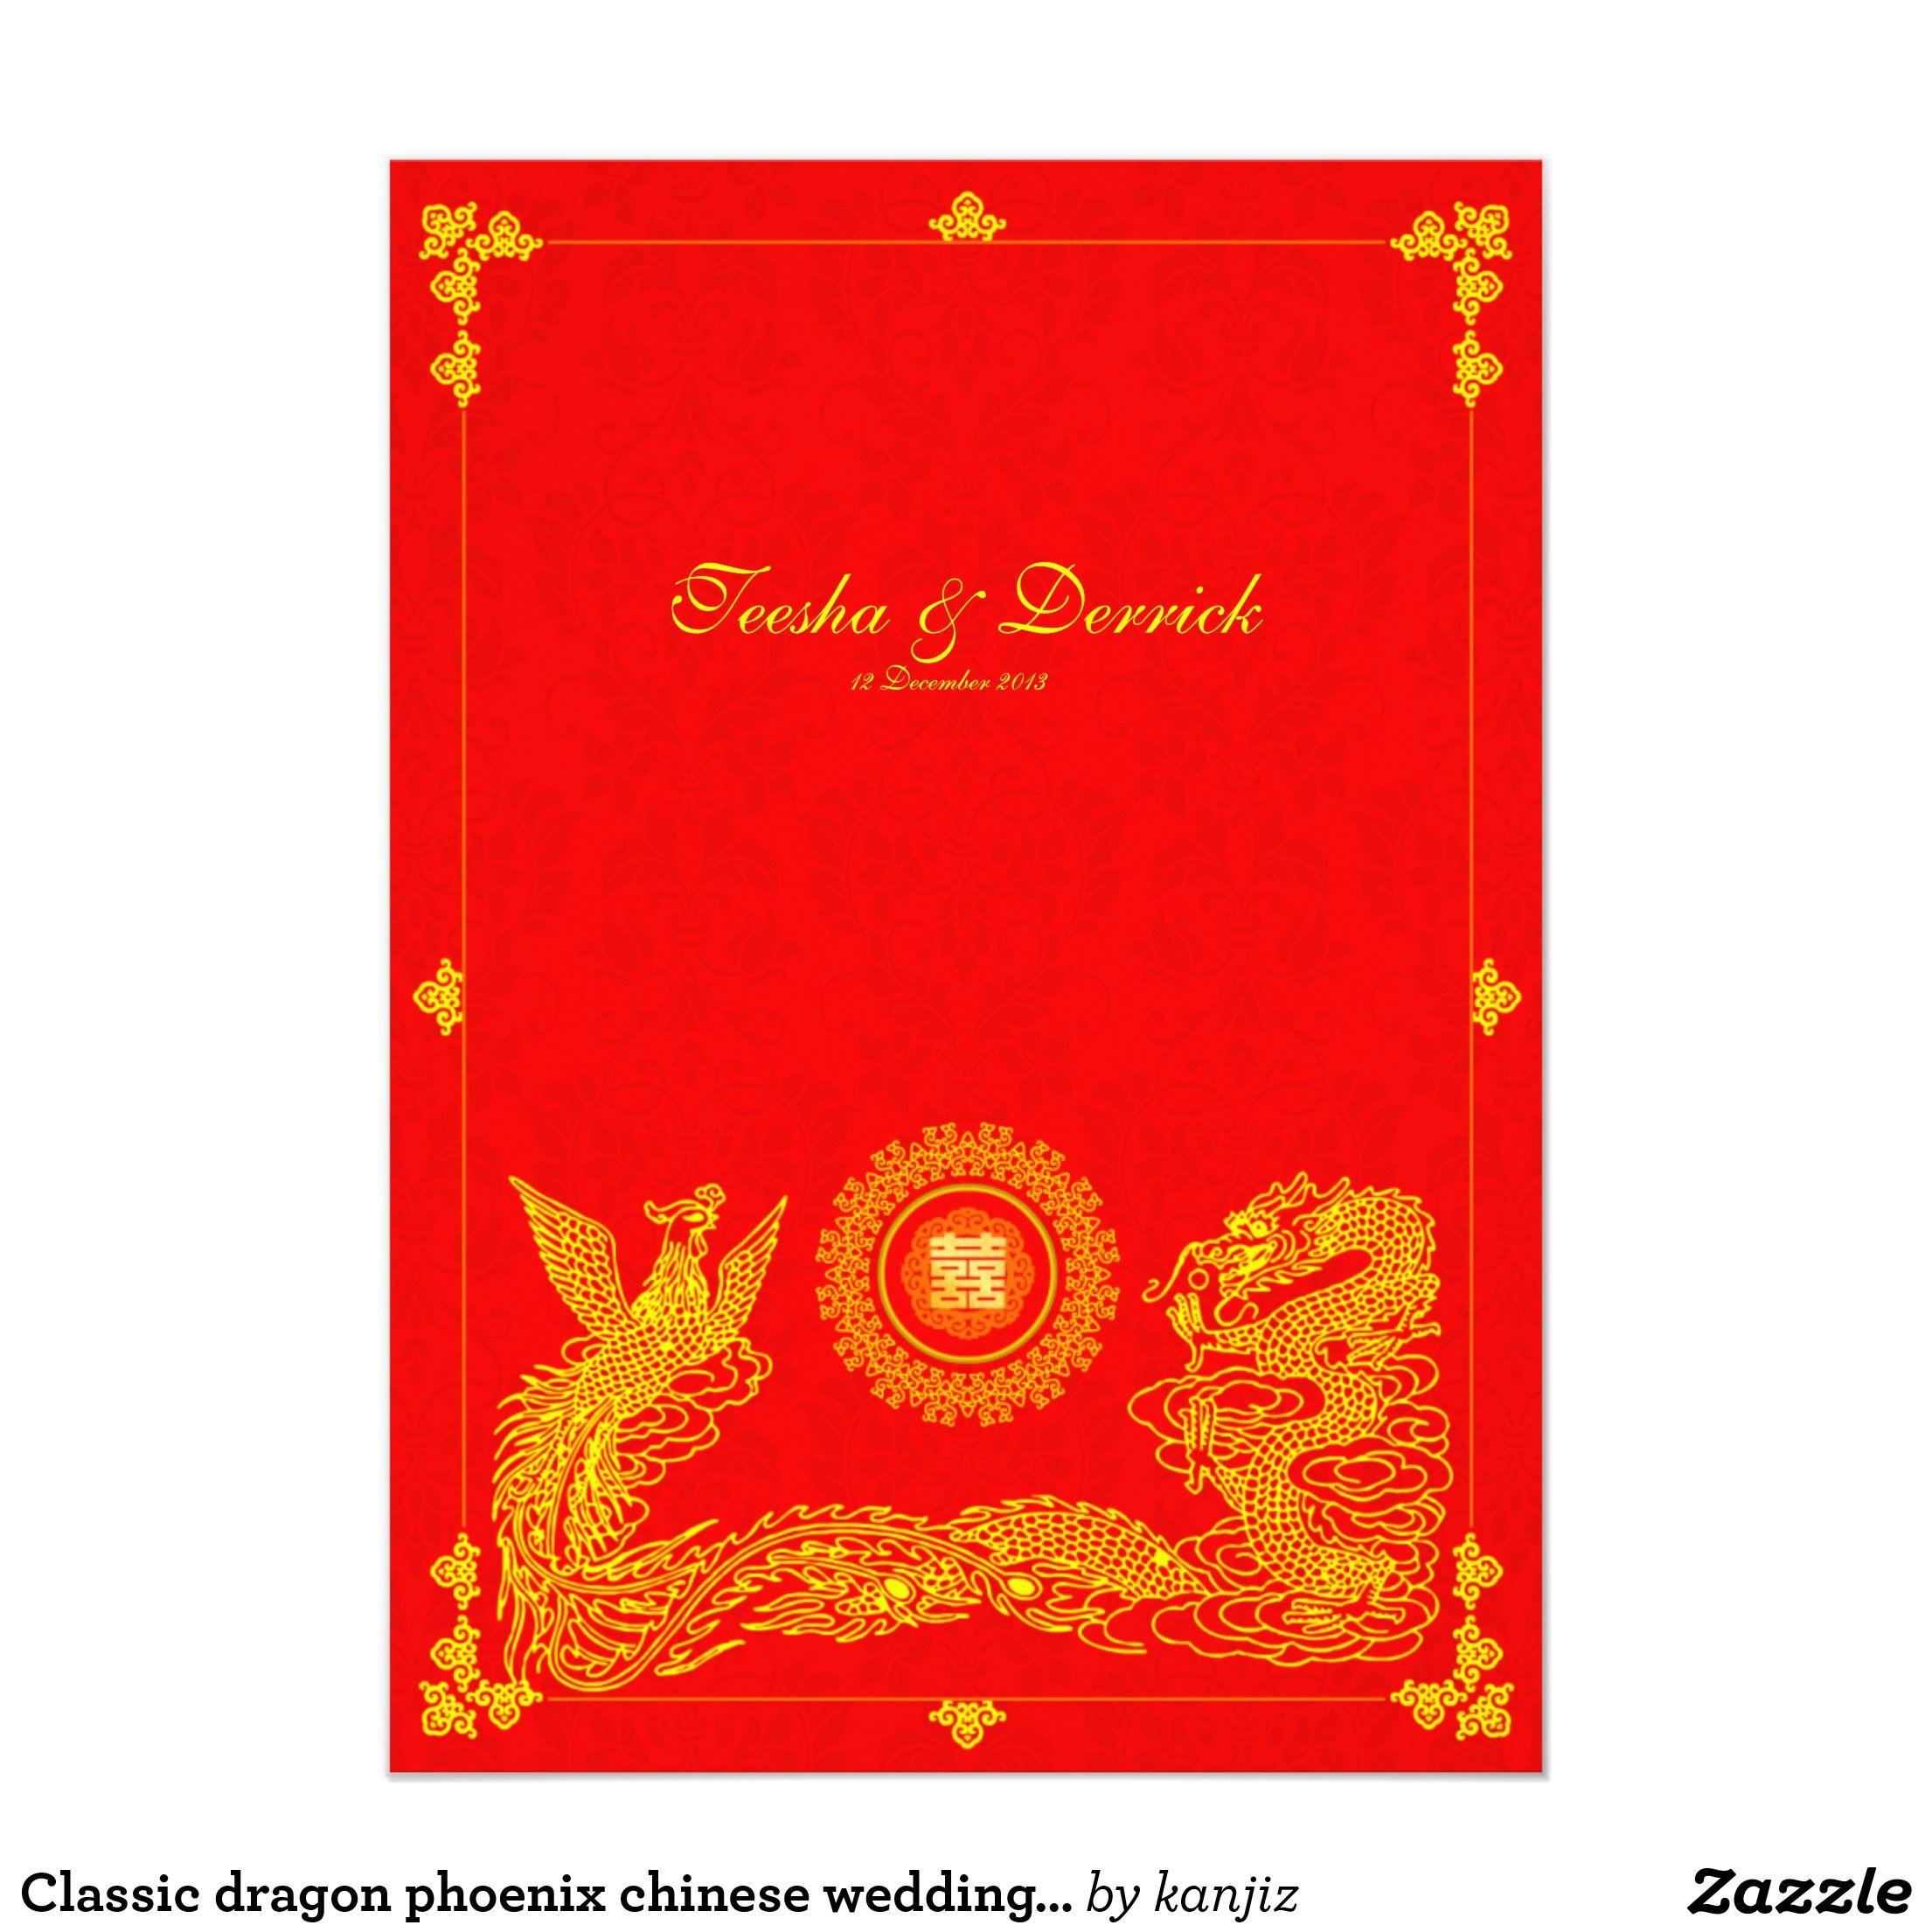 Classic dragon phoenix chinese wedding invitation | Pinterest ...